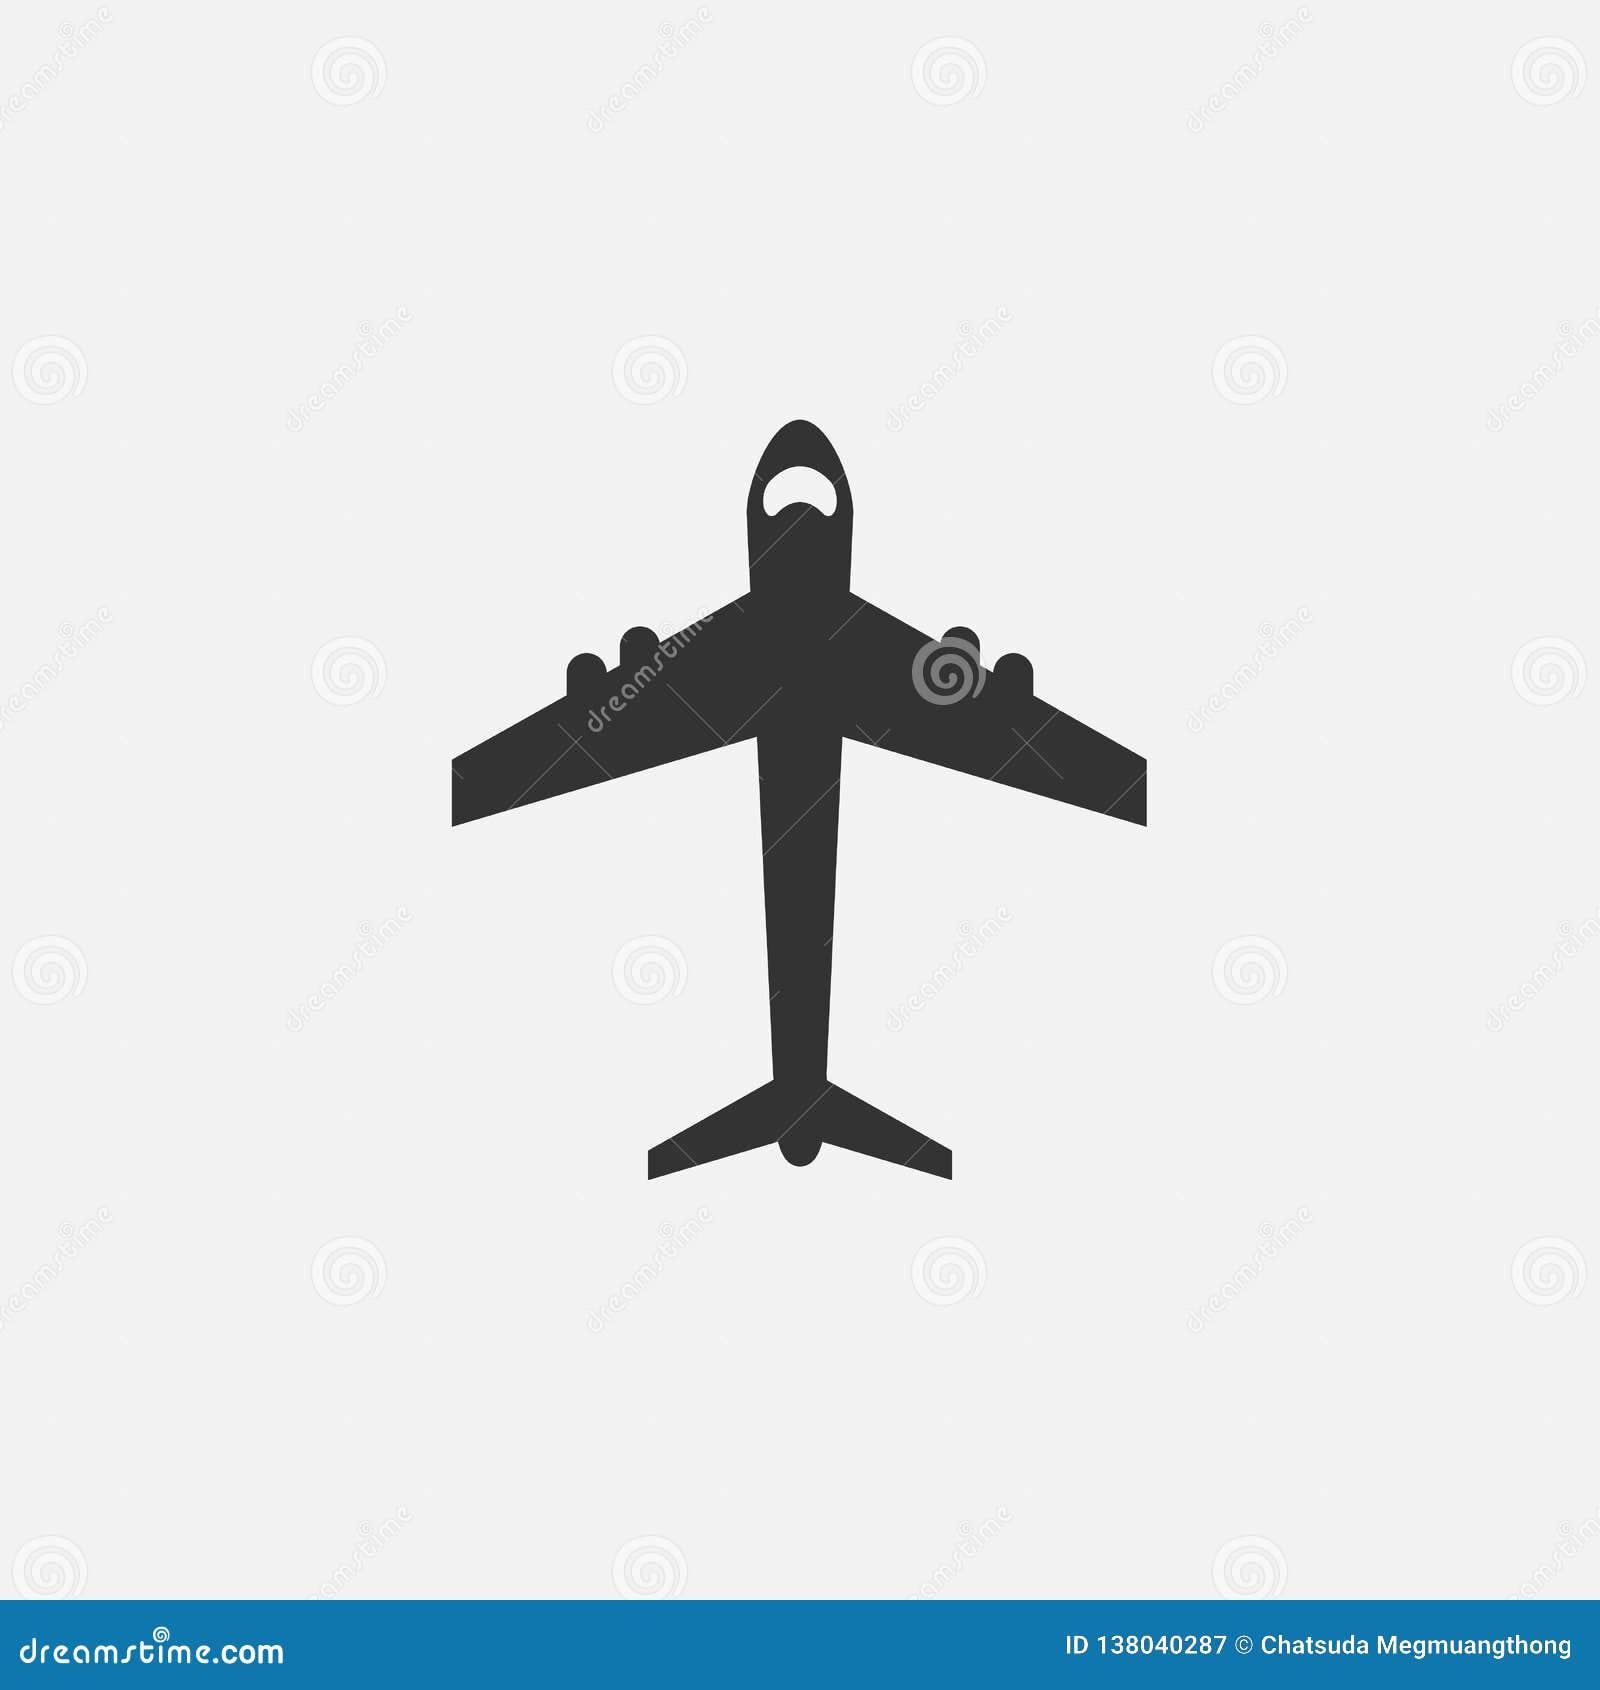 Vliegtuigen, vliegtuig, vliegtuig, vliegtuig, vlucht